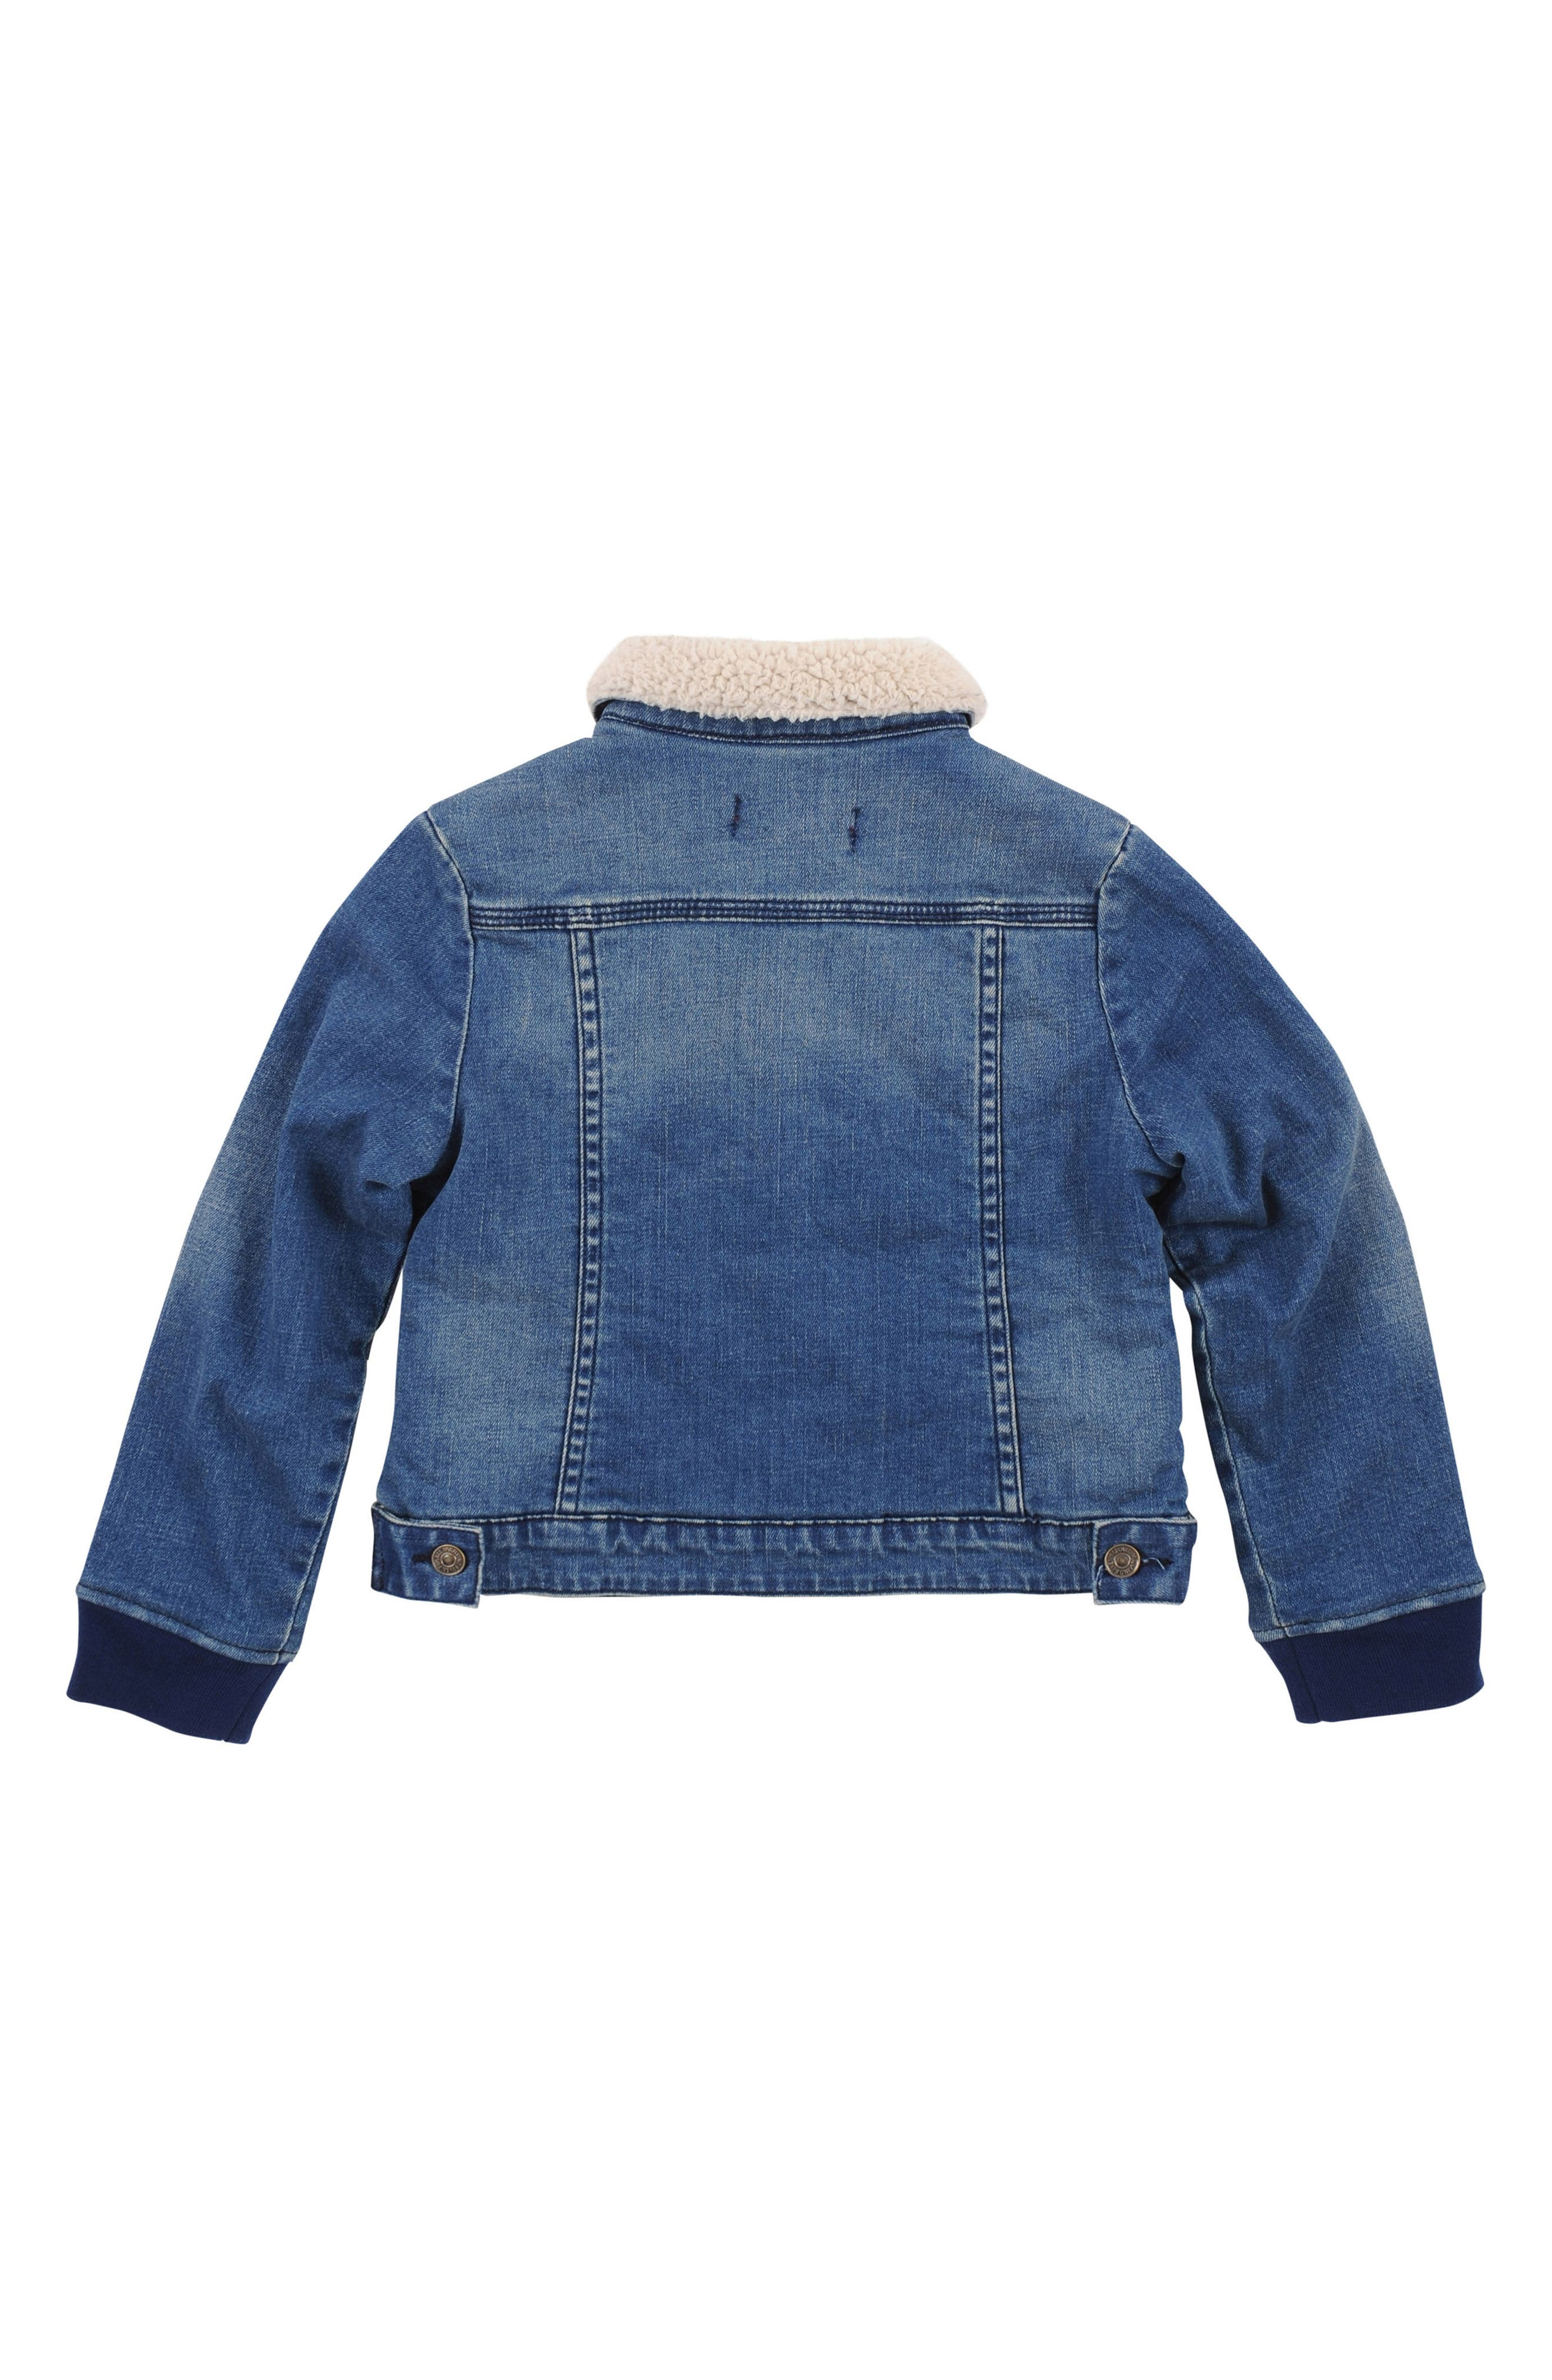 Fleece Lined Denim Jacket,                             Alternate thumbnail 2, color,                             244